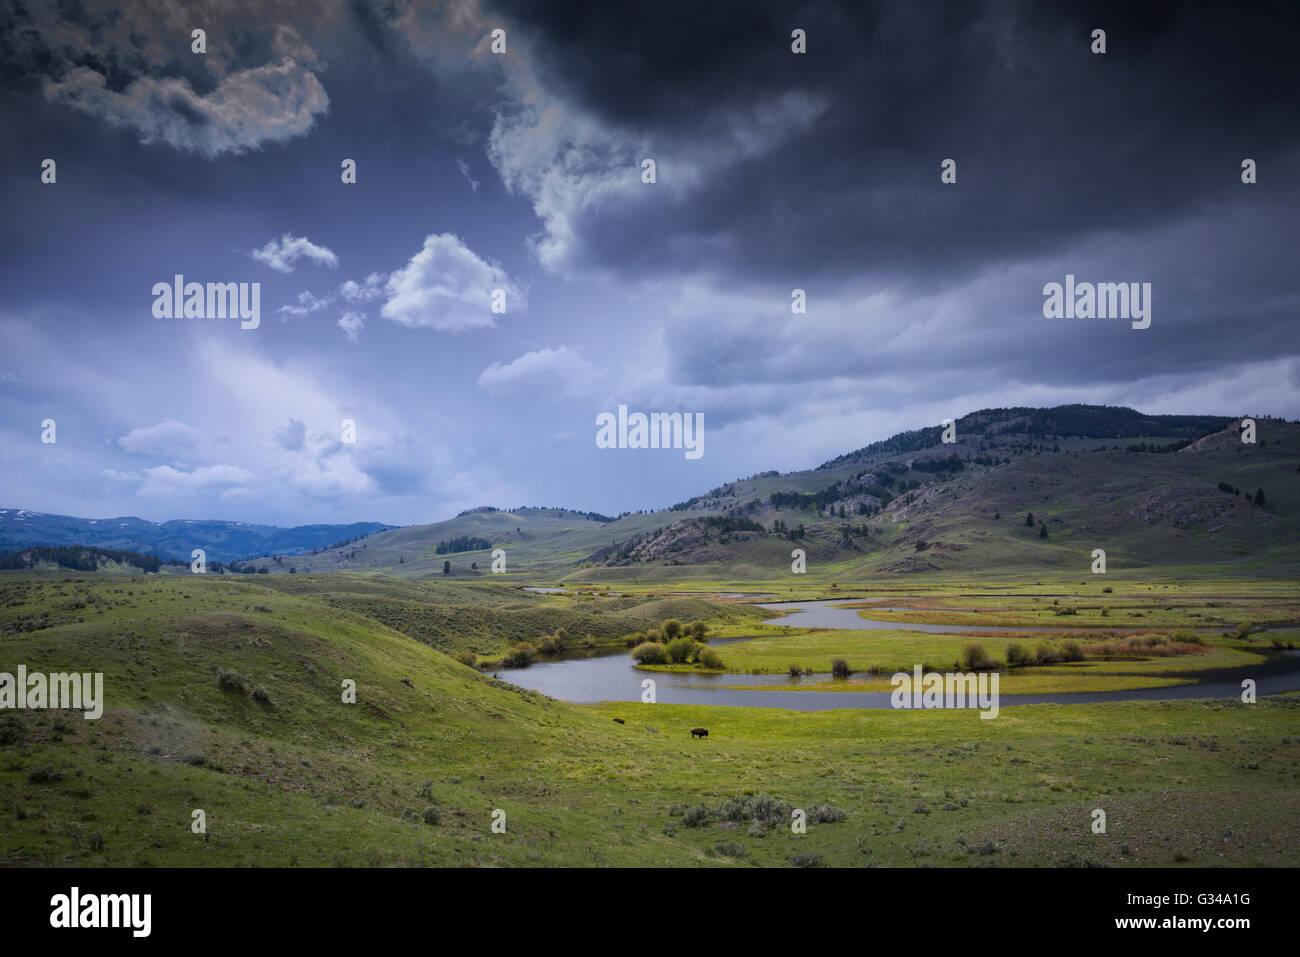 USA, Rockie Mountains, Wyoming, Yellowstone, National Park, UNESCO, World Heritage, Lamar Valley, Bison bison, buffalo, - Stock Image